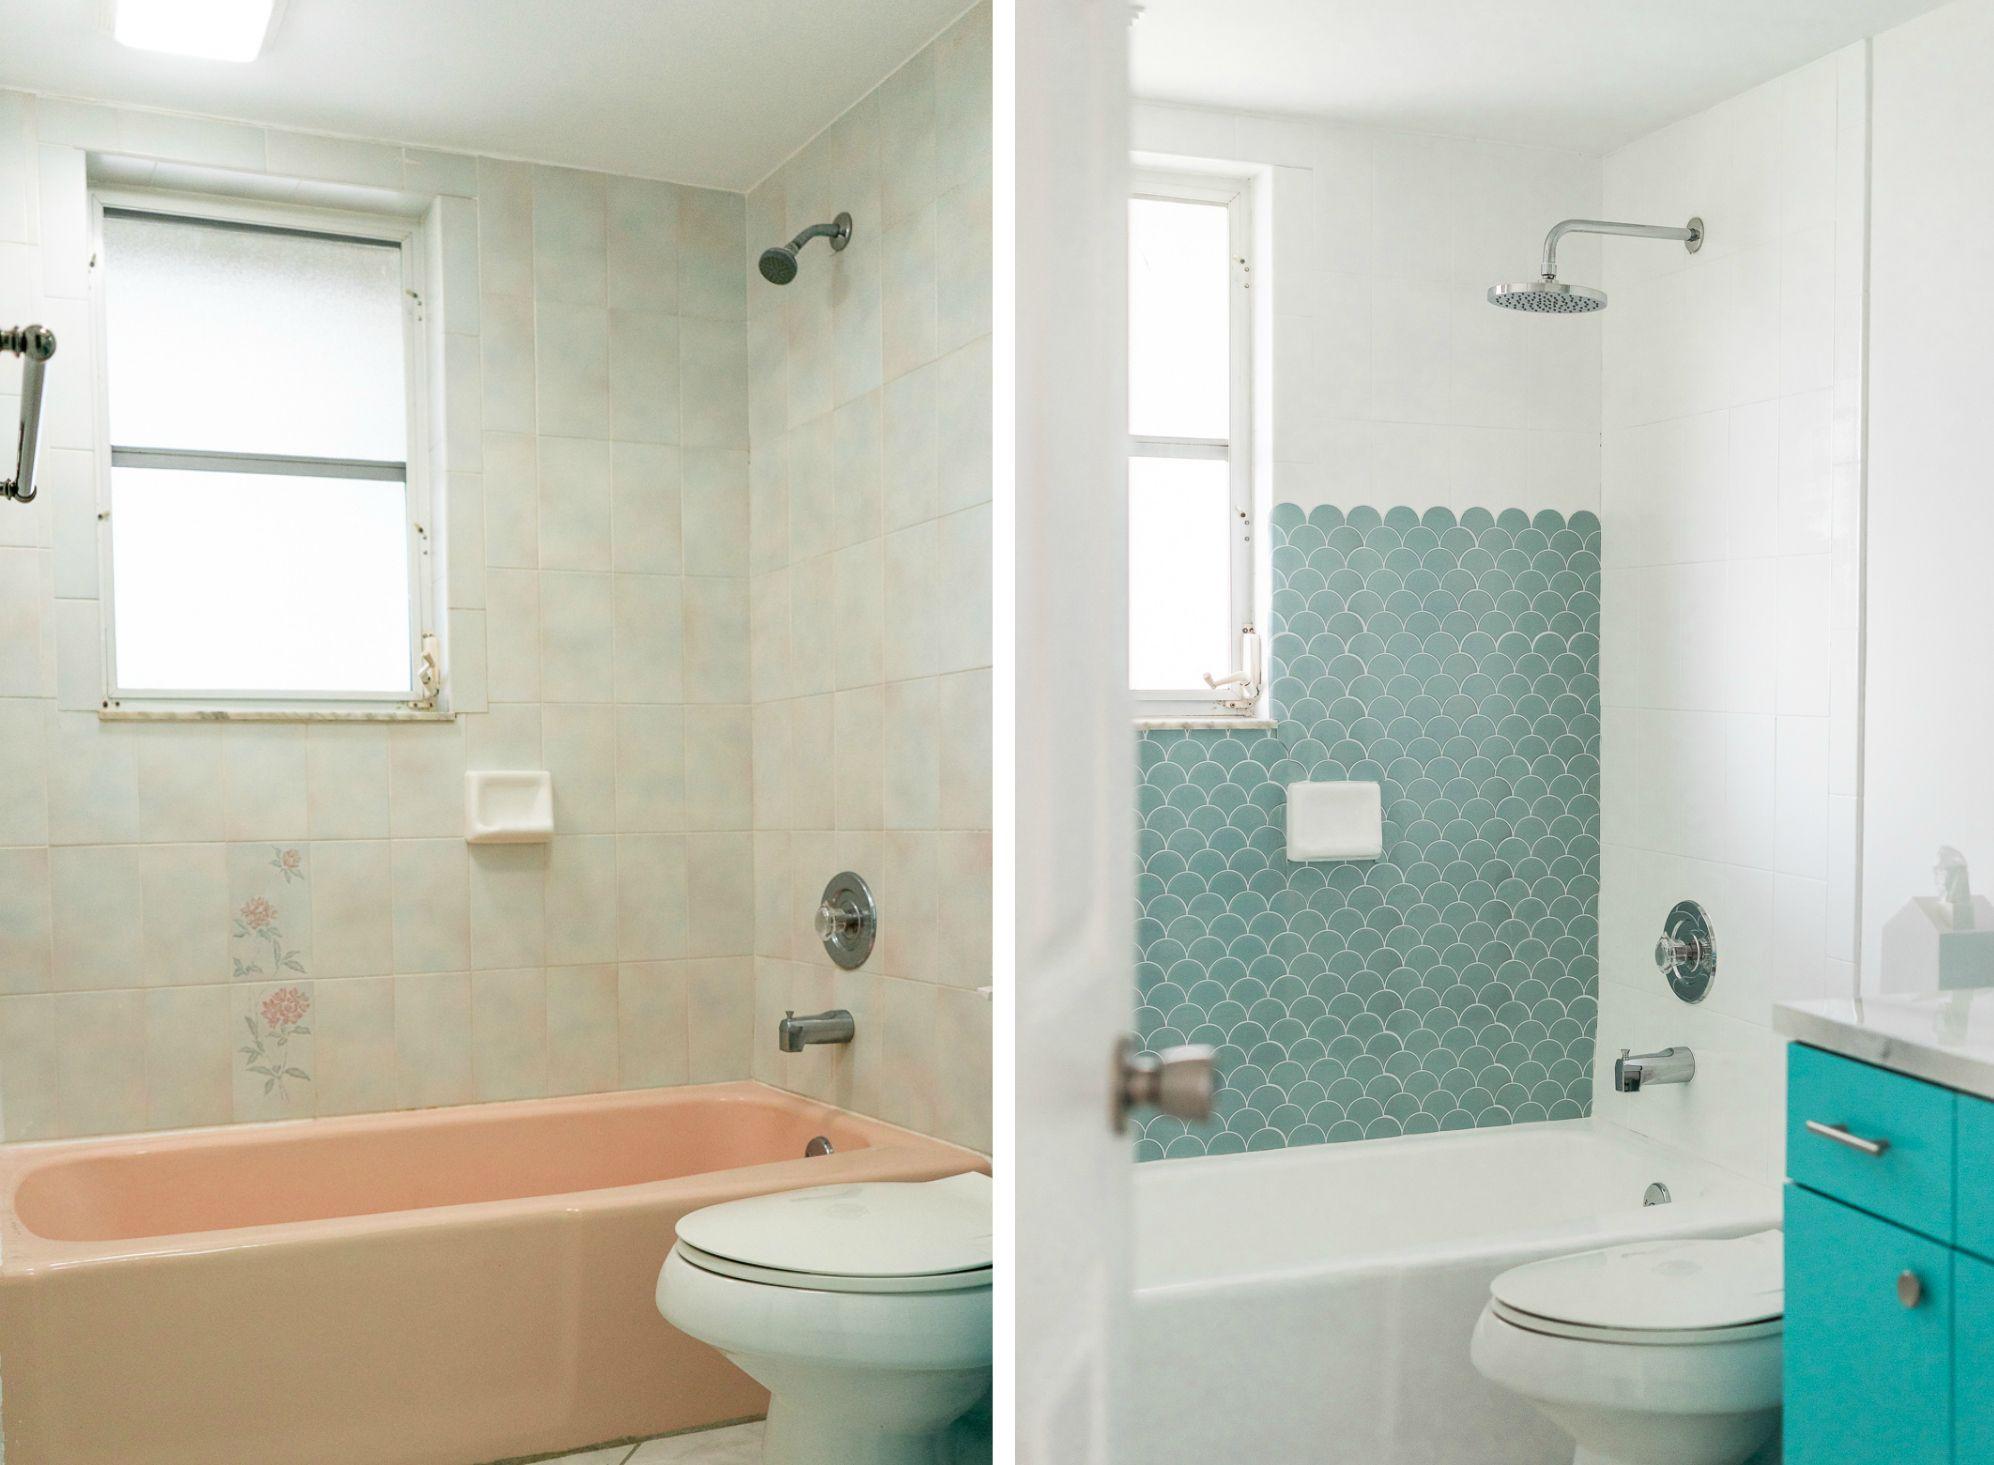 How To Paint A Bathtub And Shower For 50 Refinish Tub Painted Tub In 2020 Tub Tile Bathtub Walls Bathtub Makeover